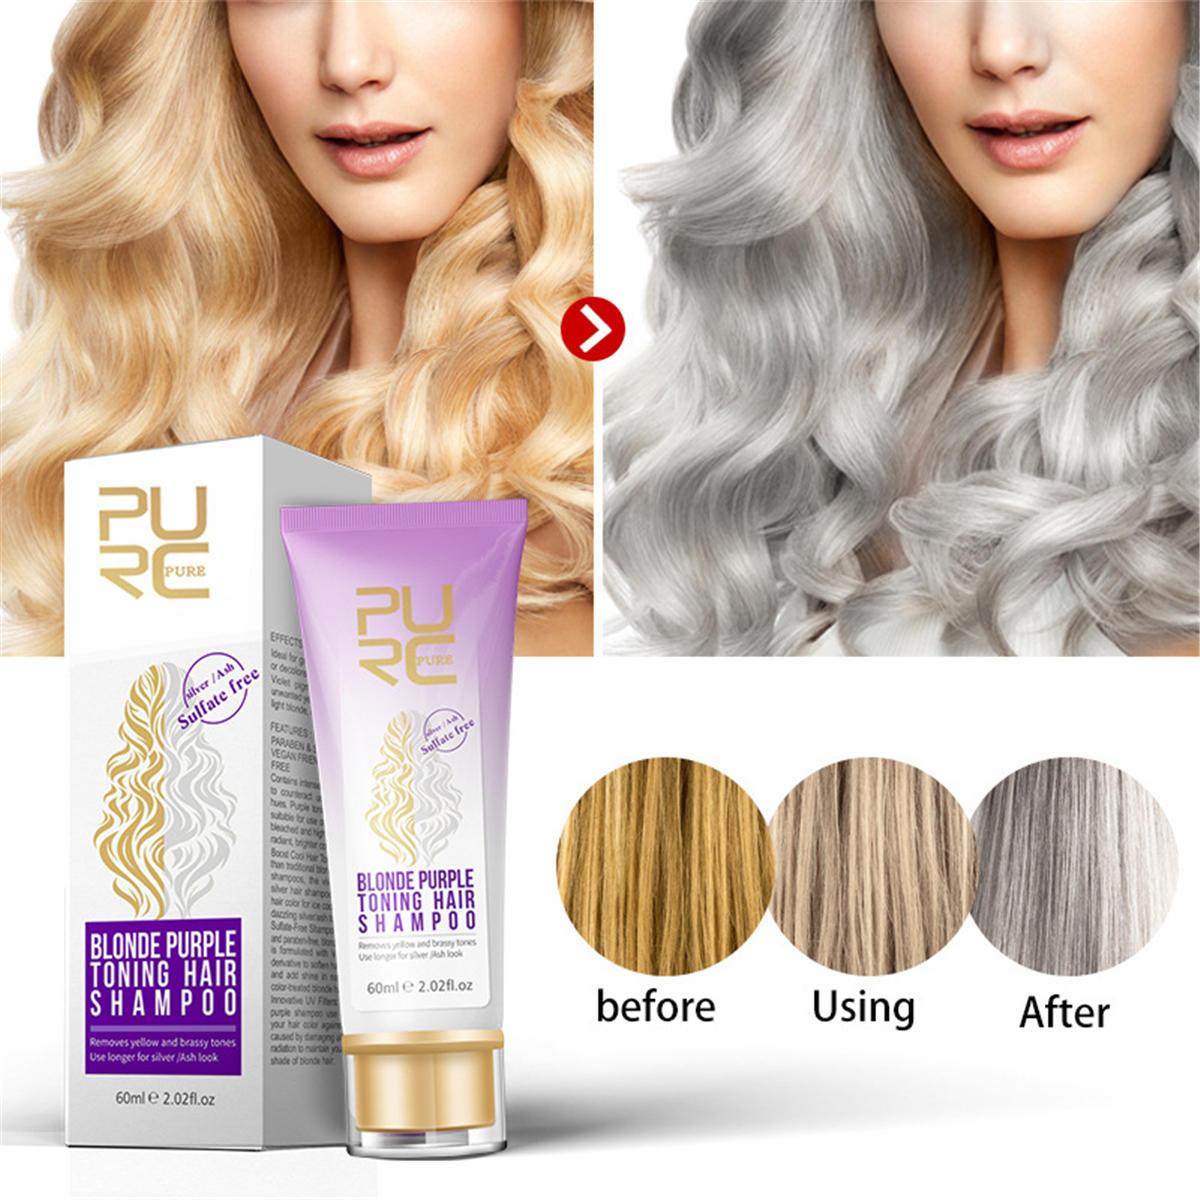 PURC PURPLE SHAMPOO FOR BLONDE SILVER GRAY HAIR Conditioners Shampoo